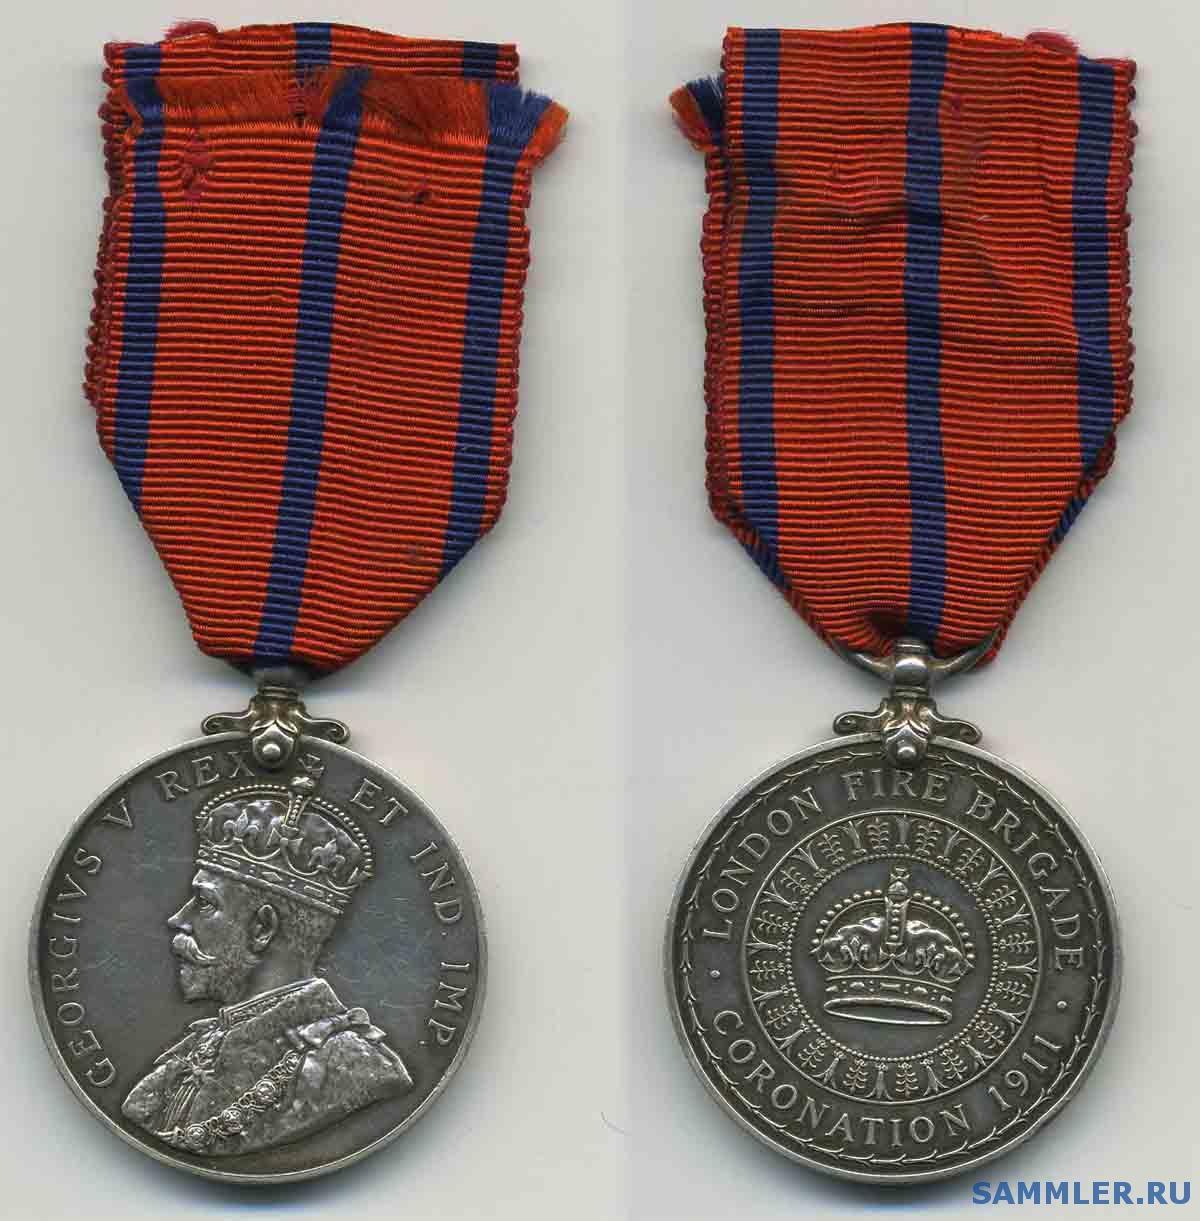 Coronation_1911_Medal_London_Fire_Brigade_G_V_.jpg